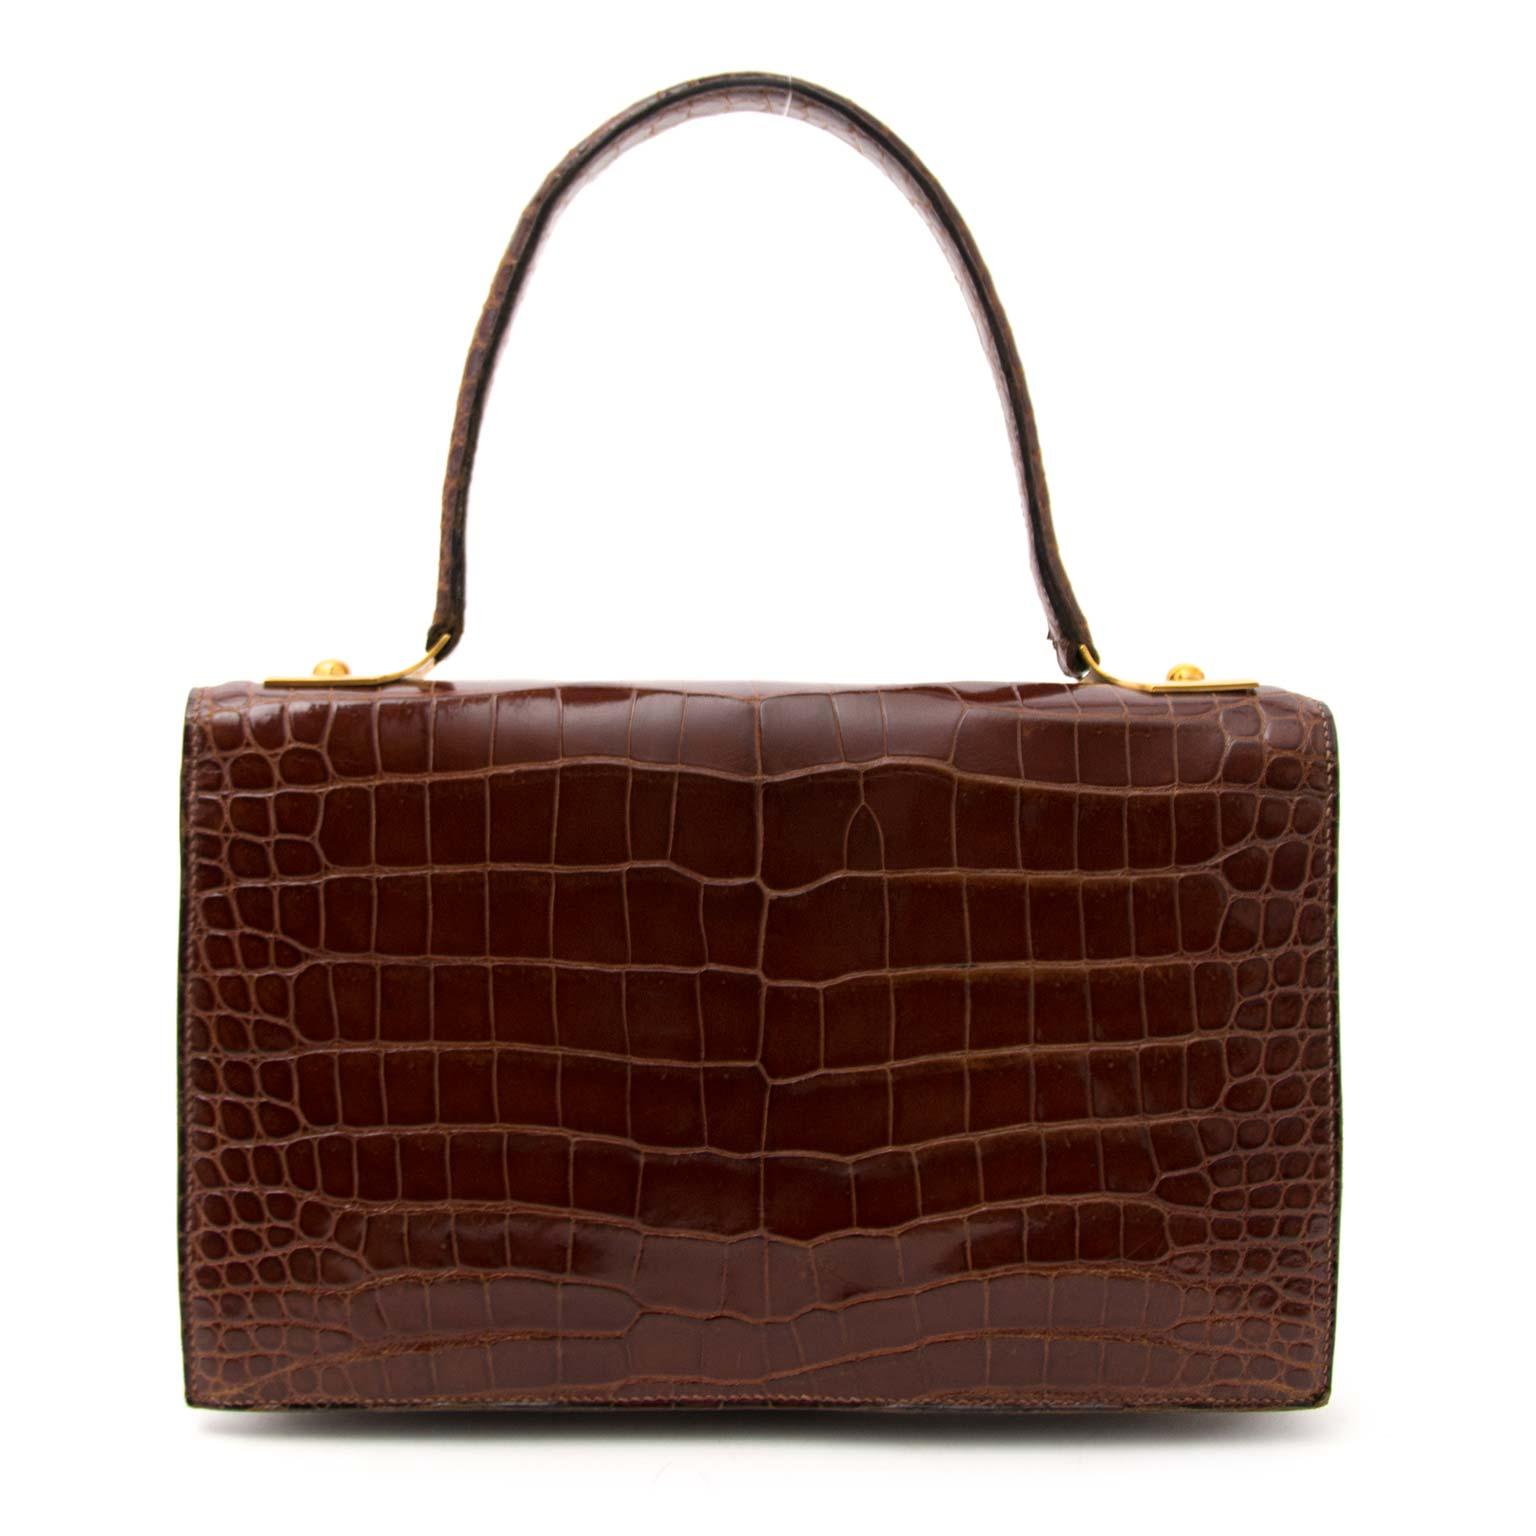 shop vintage luxury at the best price Hermes Vintage Croco Shoulder Bag  100% authentic